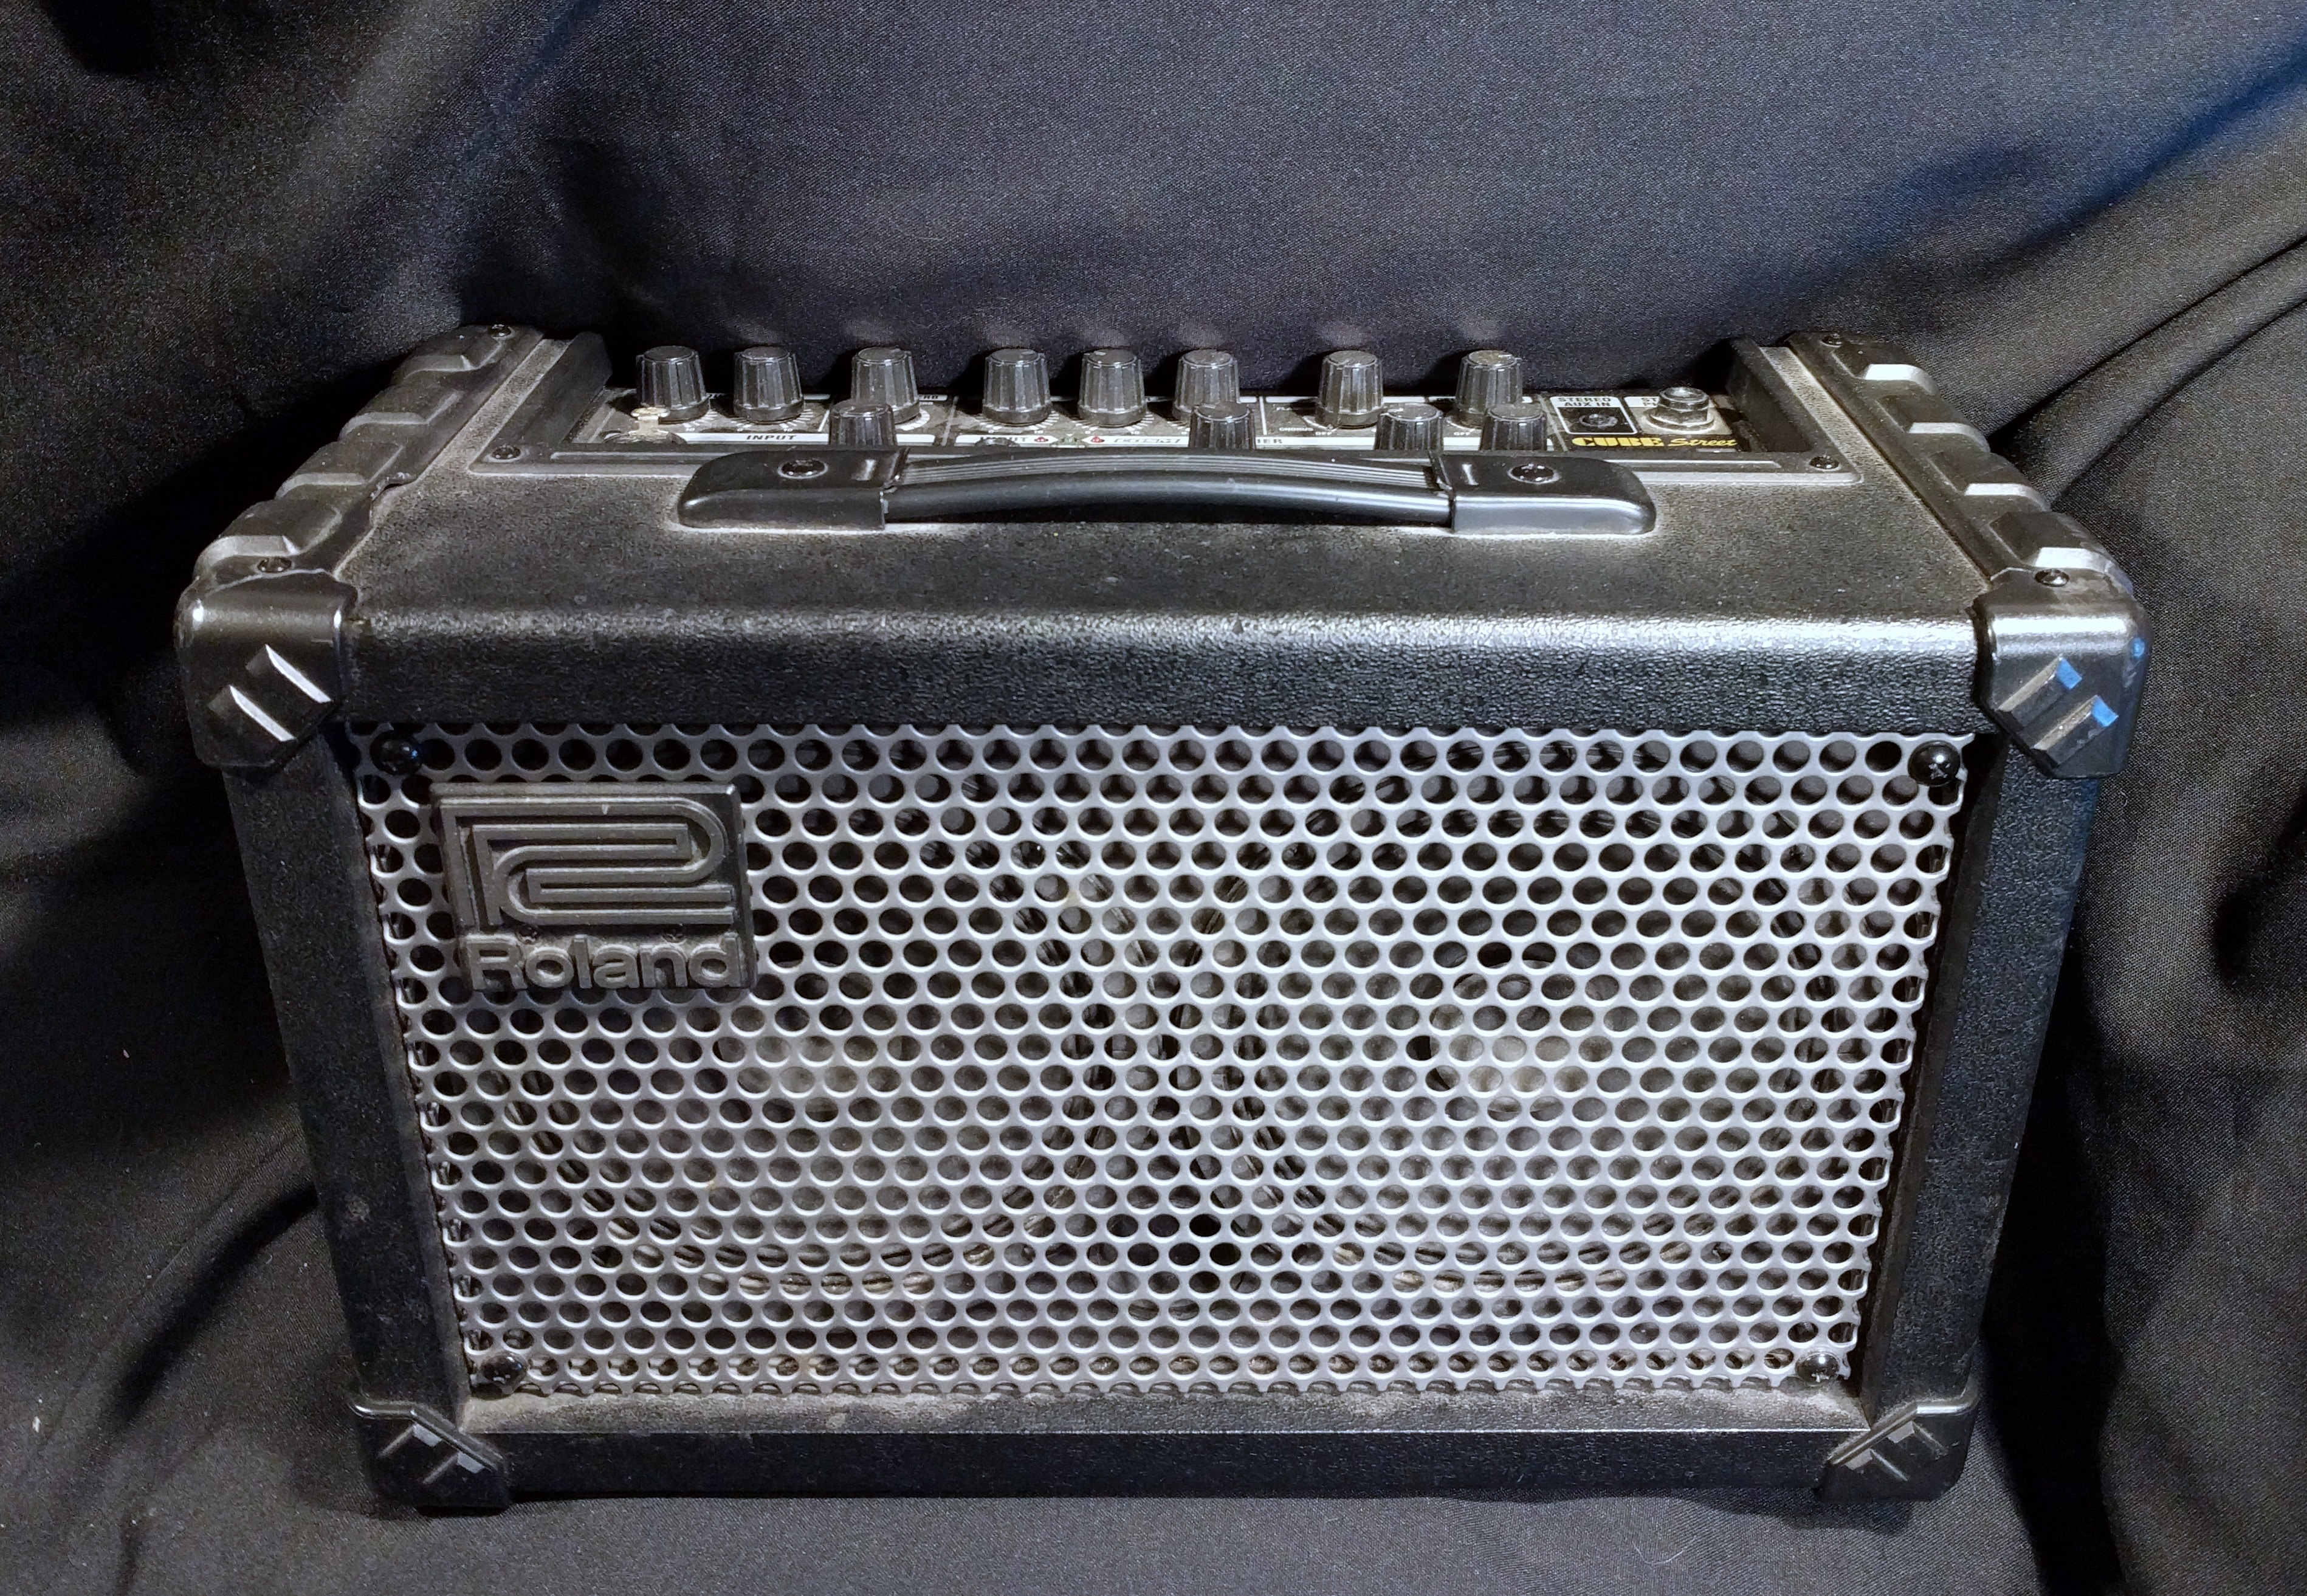 roland cube street amplifier amp 2 channel guitar vocal portable battery powered ebay. Black Bedroom Furniture Sets. Home Design Ideas